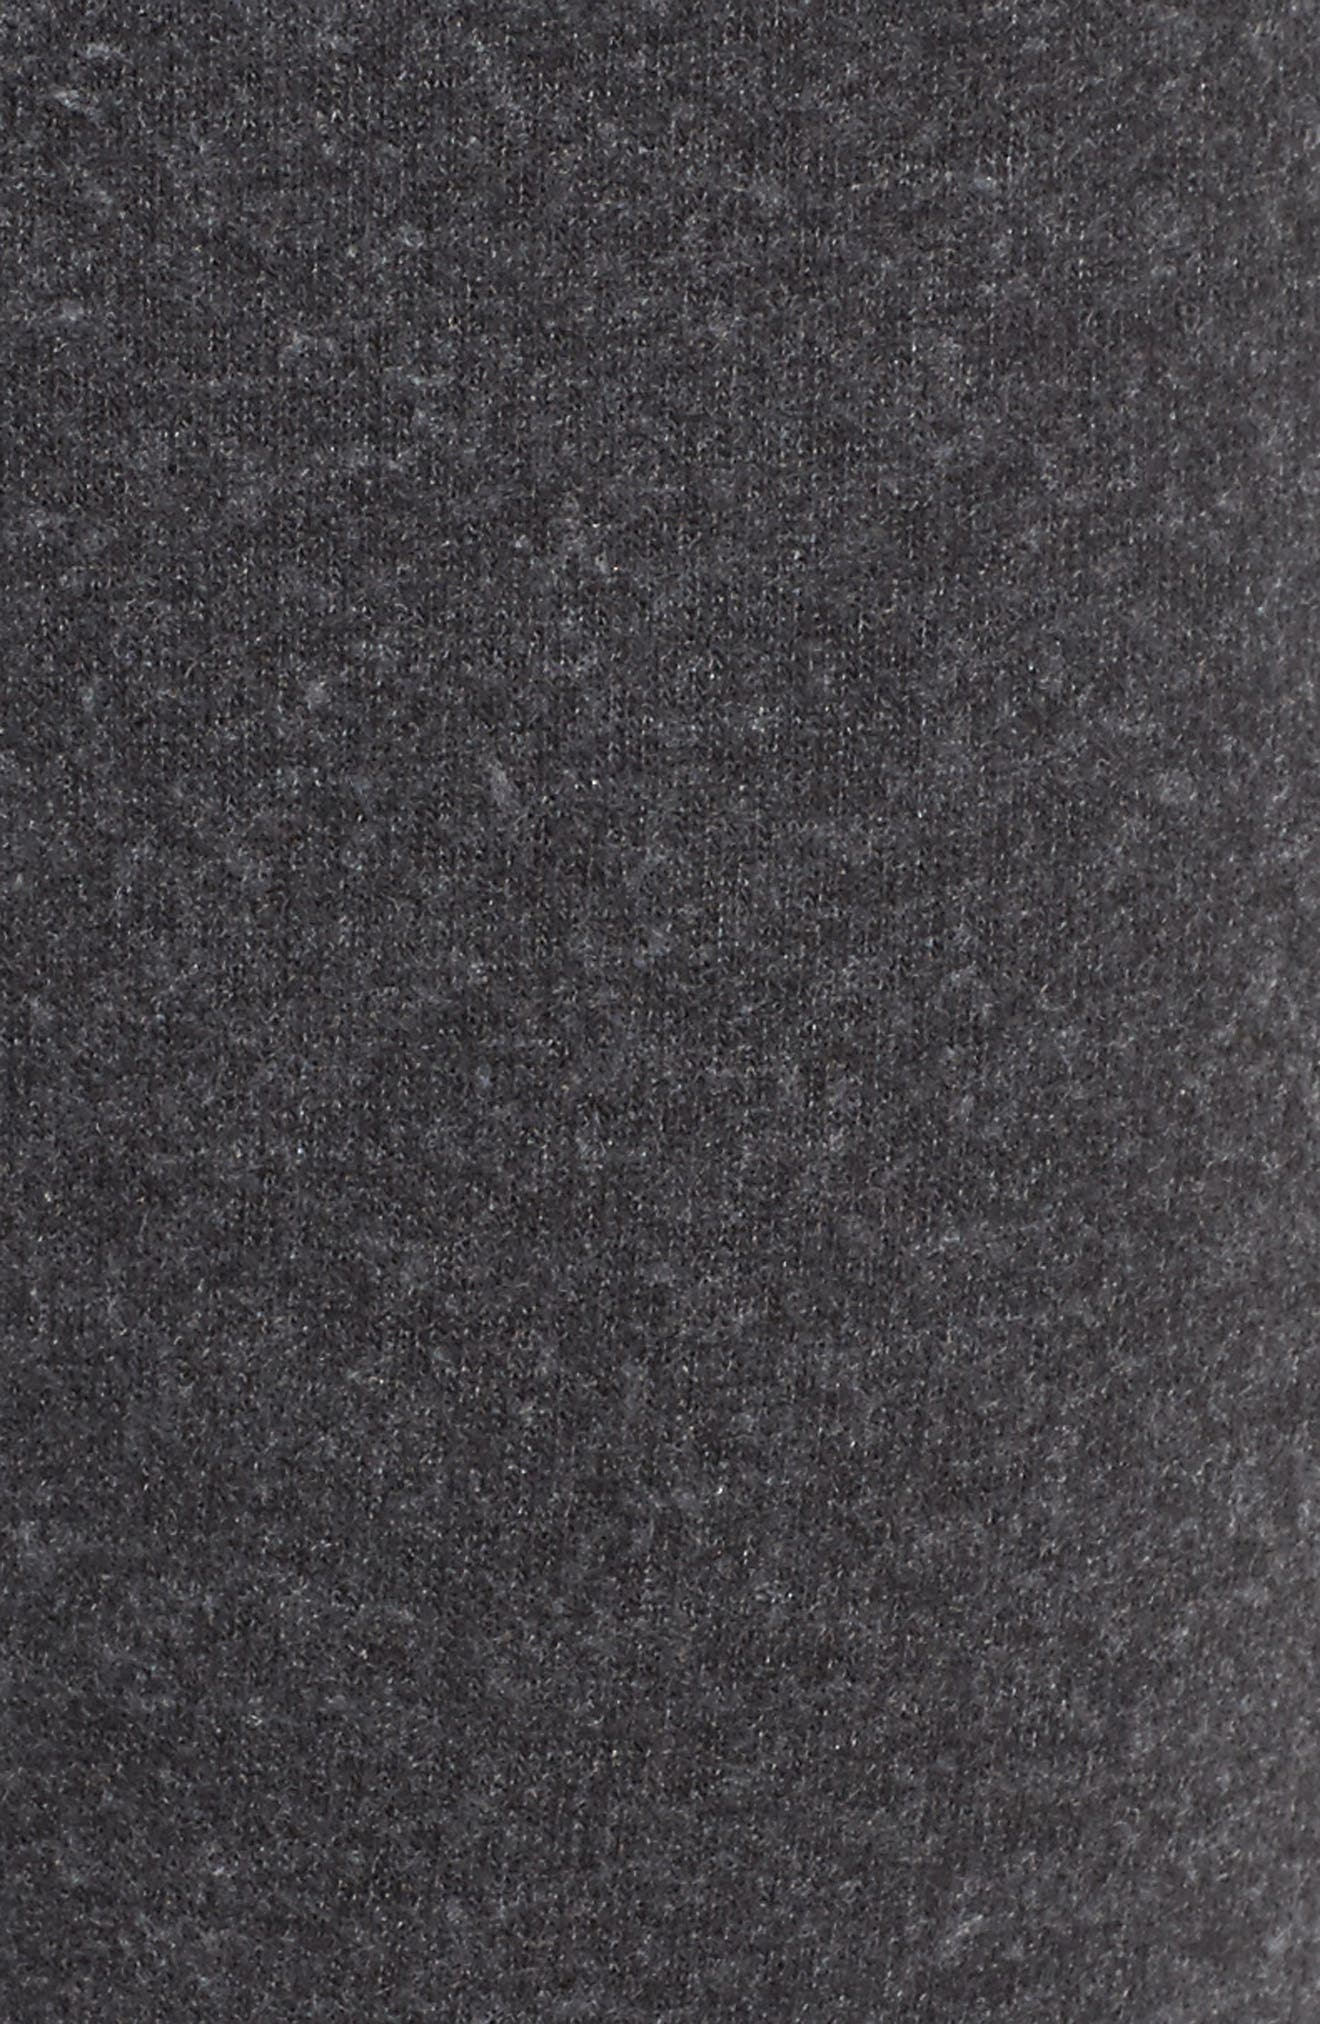 Love Lounge Jogger Pants,                             Alternate thumbnail 7, color,                             Black